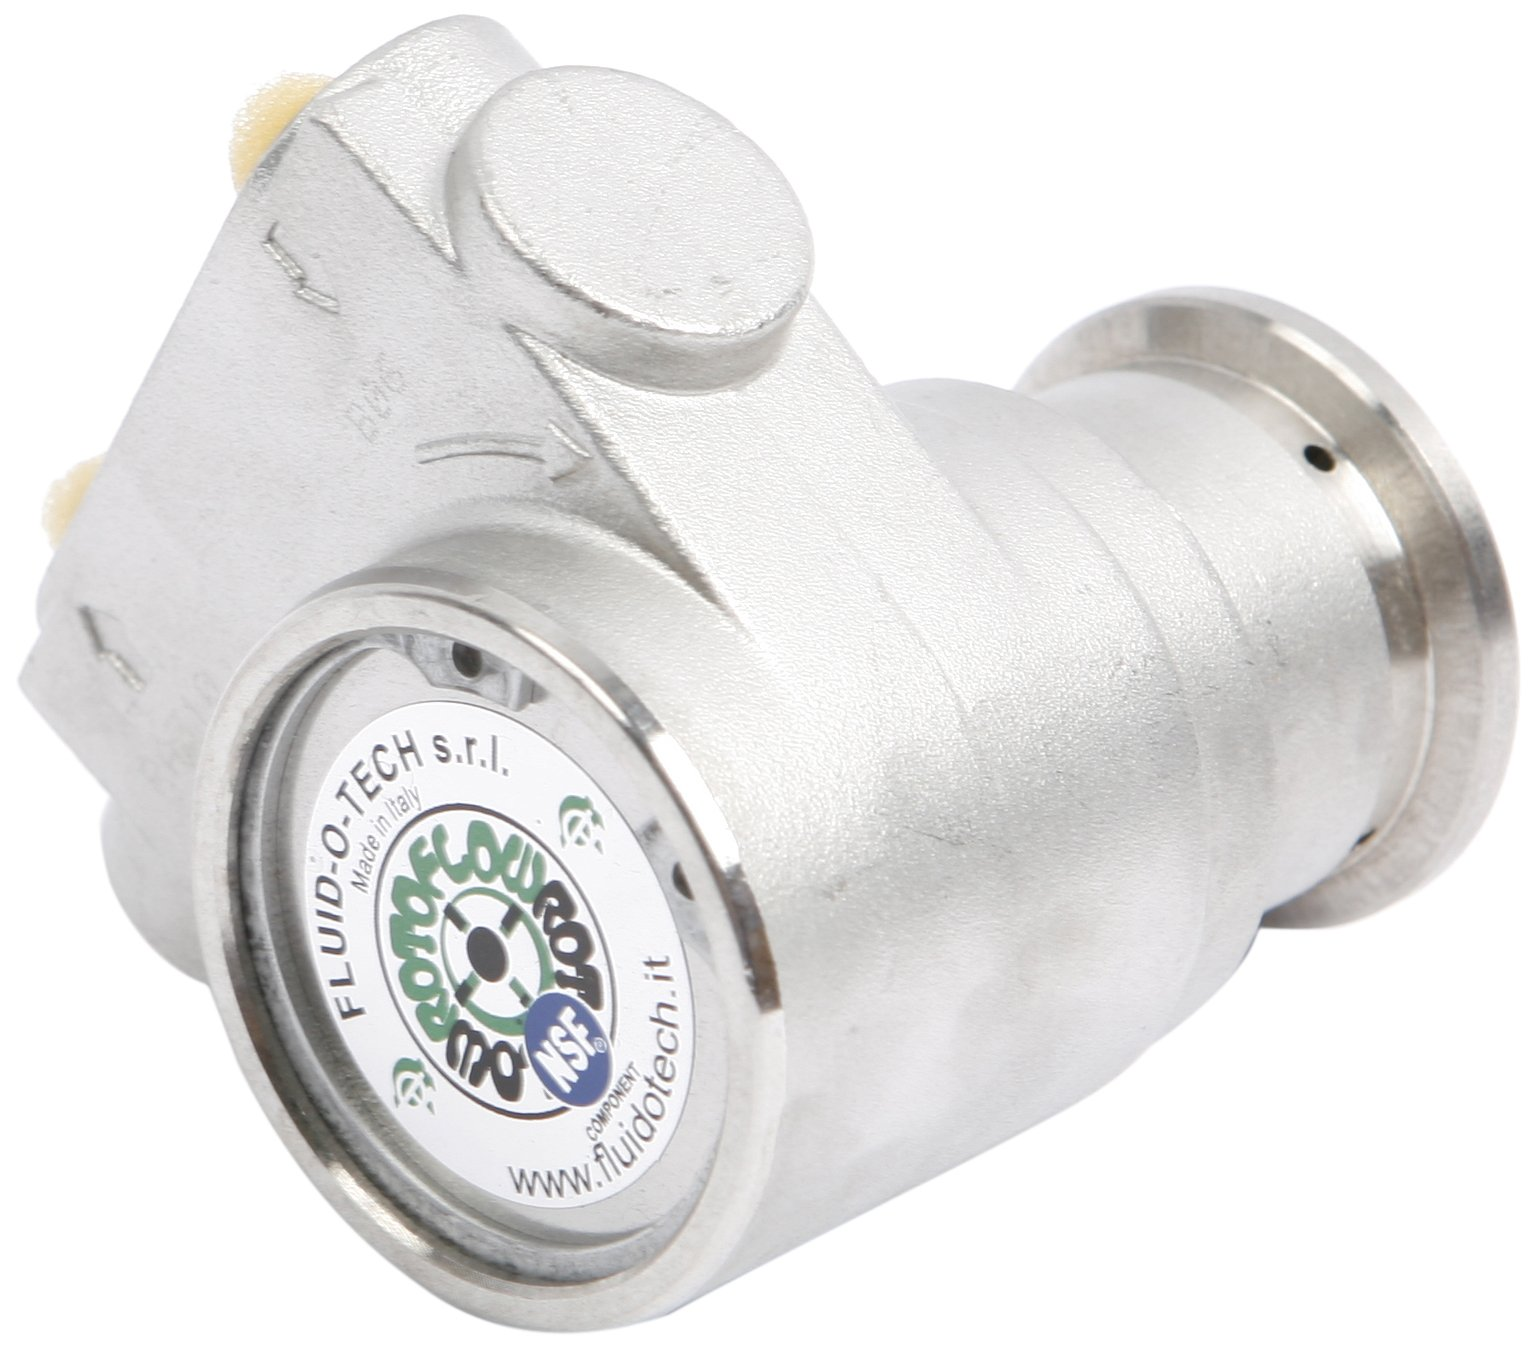 Fluid O Tech A310 Stainless Steel Pump Assembly